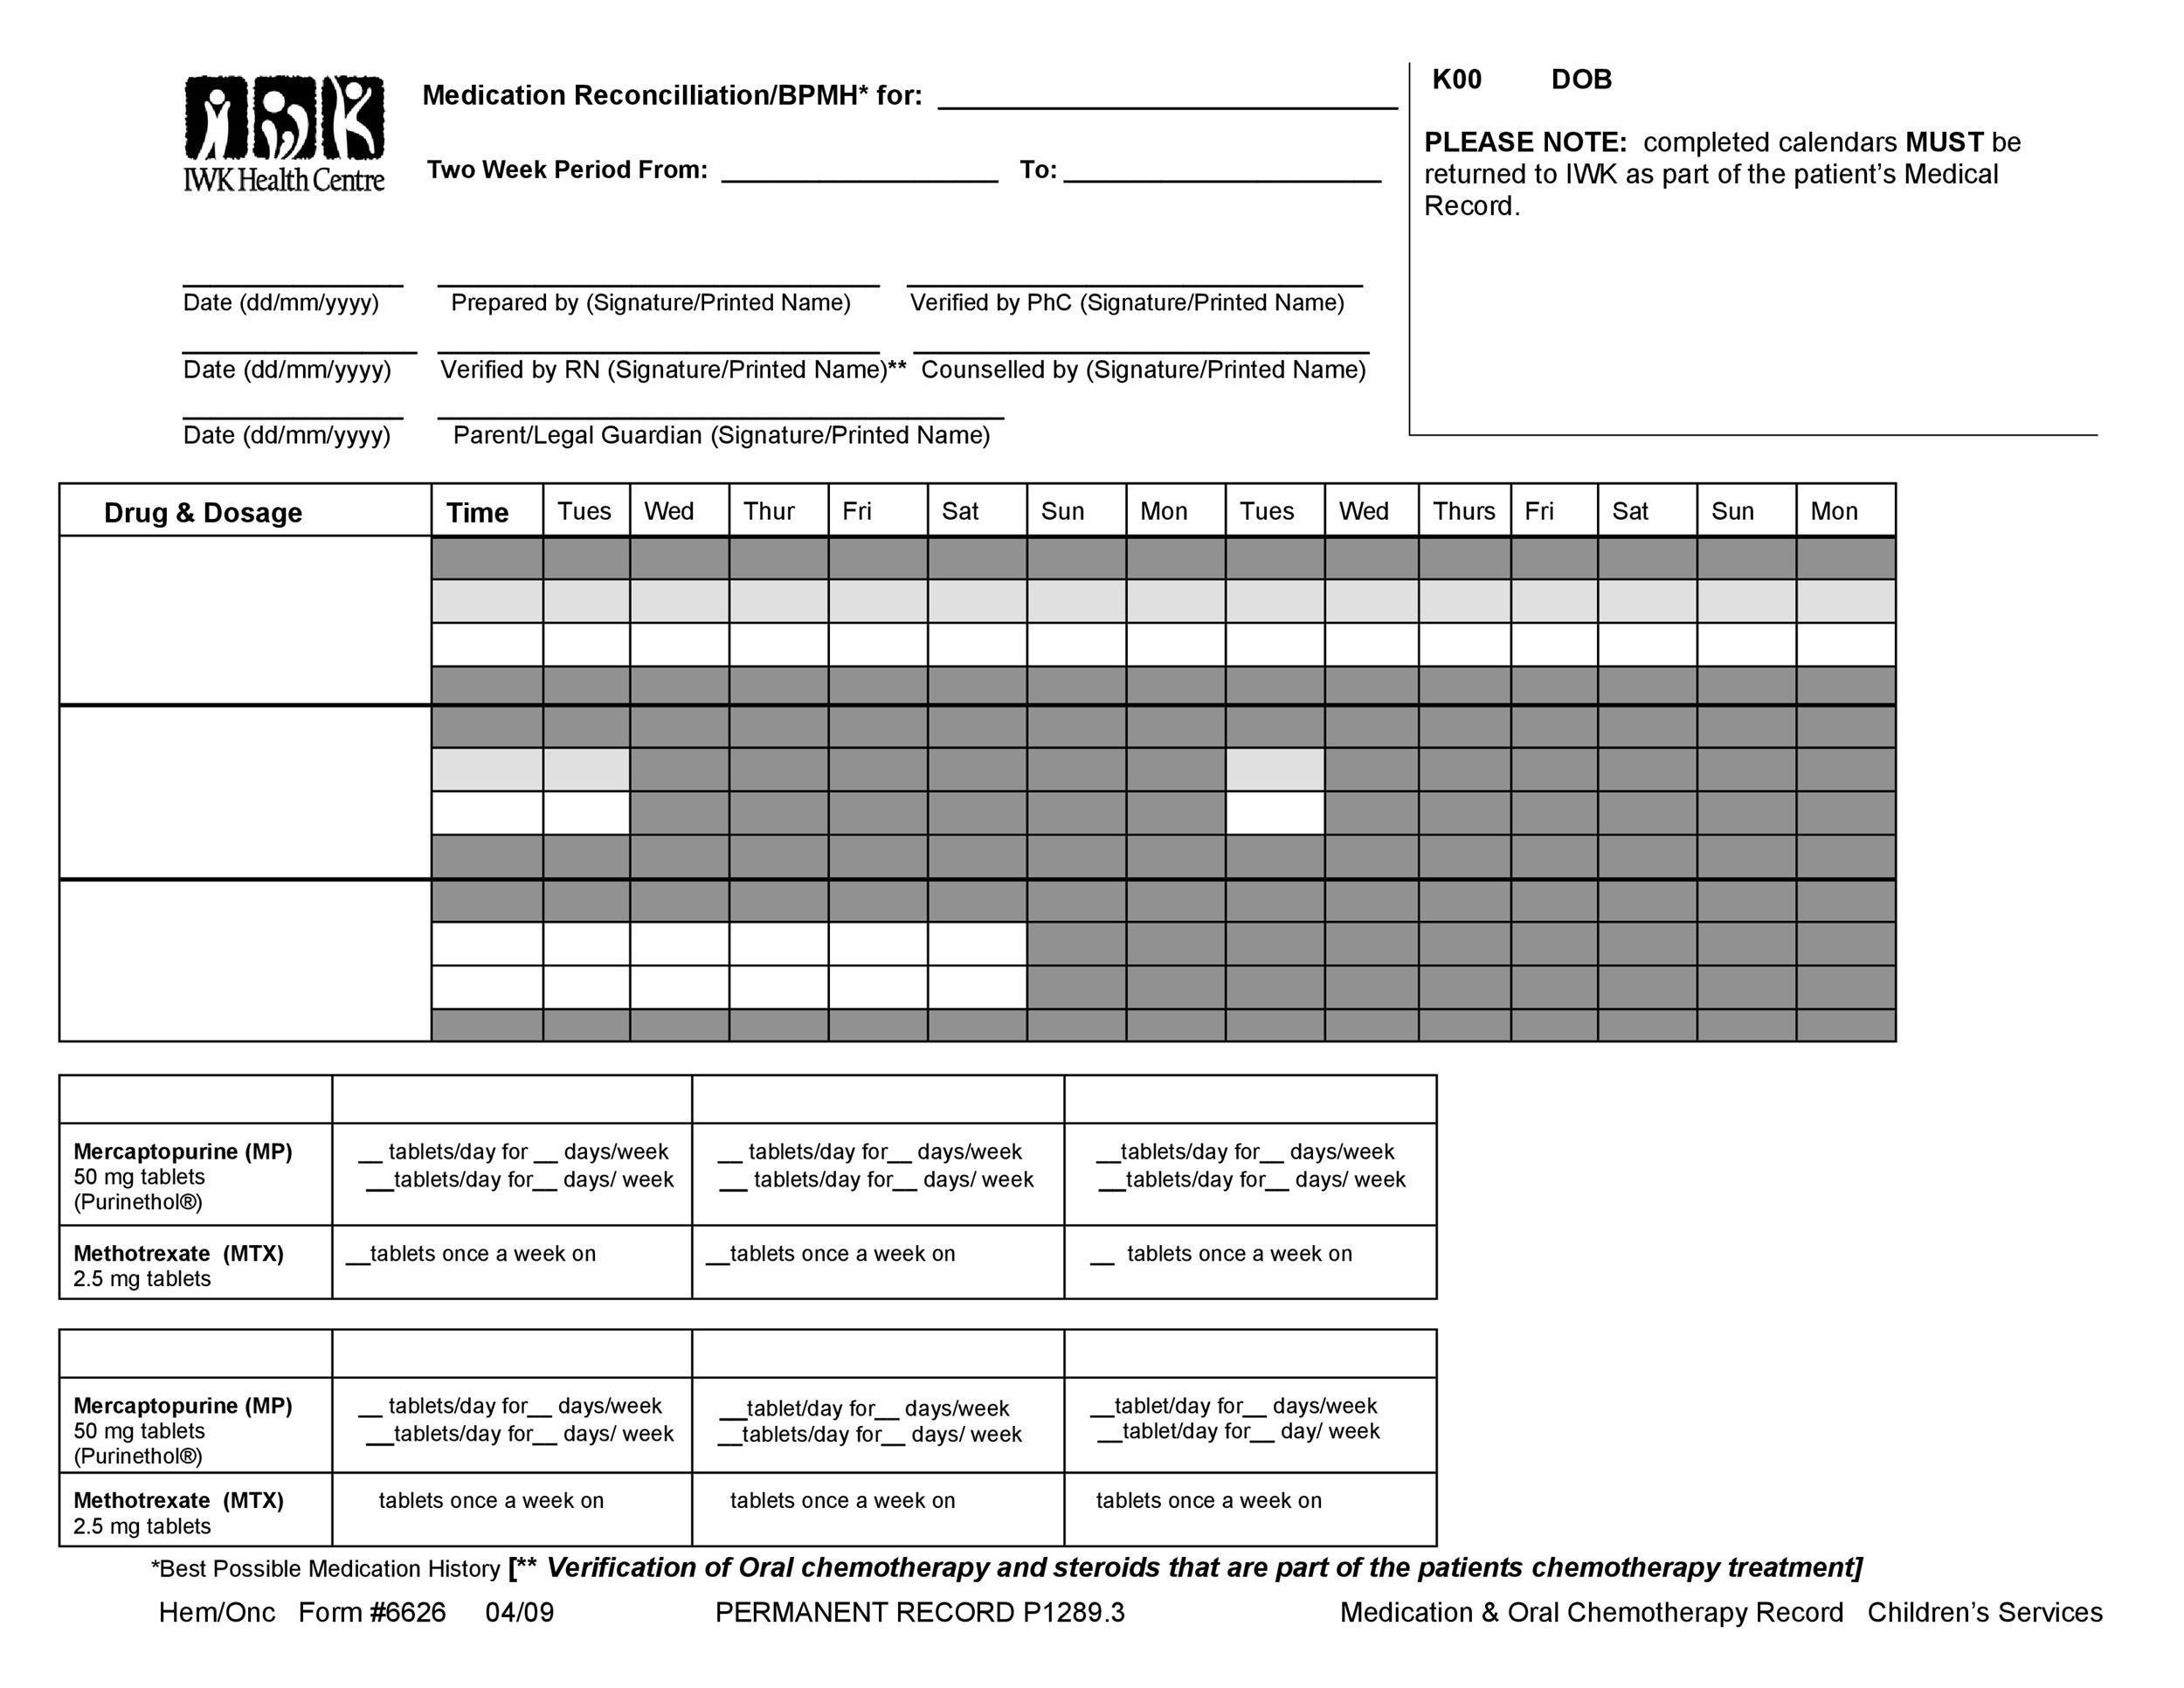 40 Great Medication Schedule Templates (+Medication Calendars)